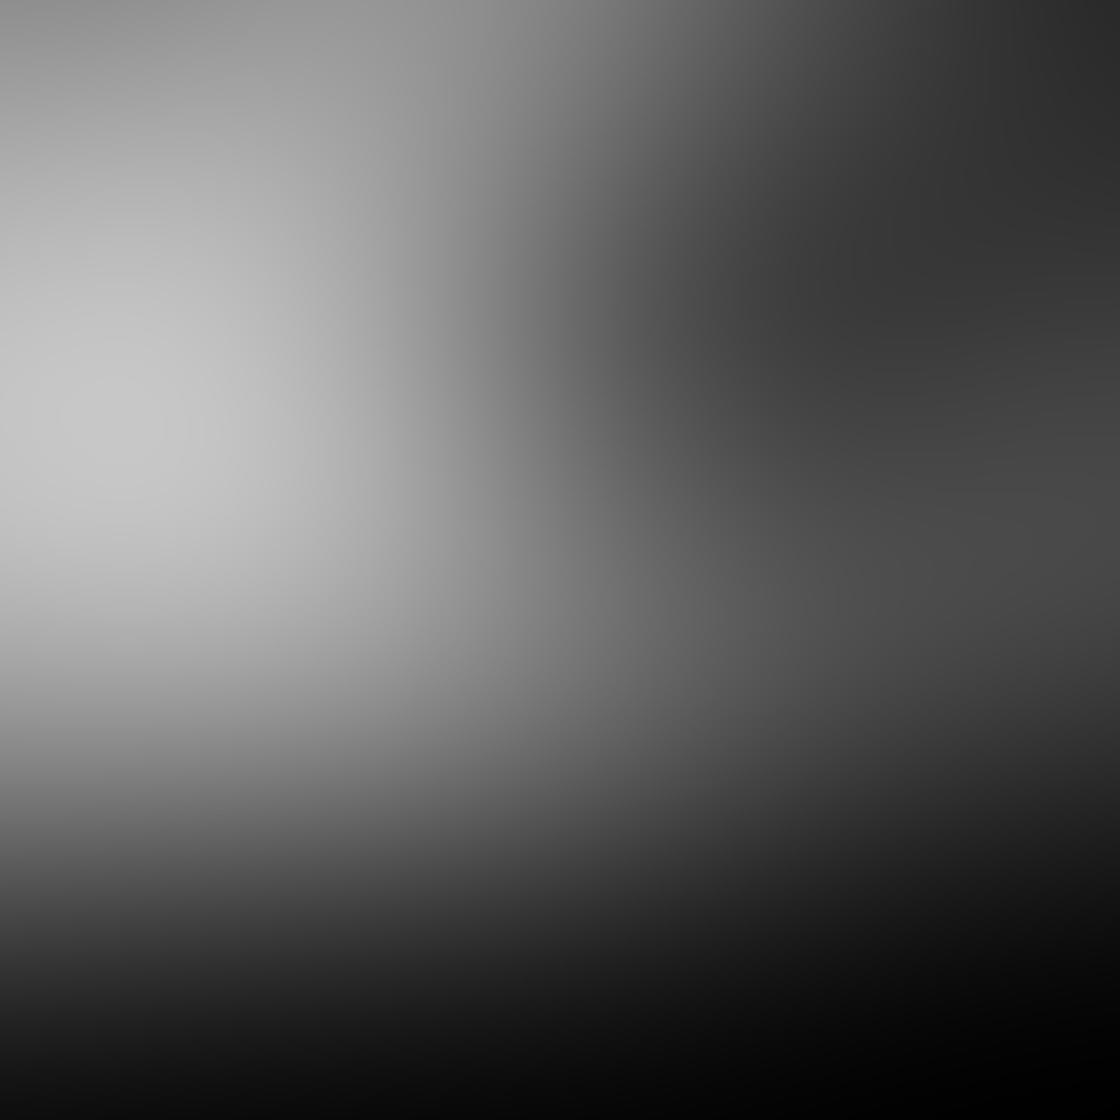 Ordinary iPhone Photo Subjects 127